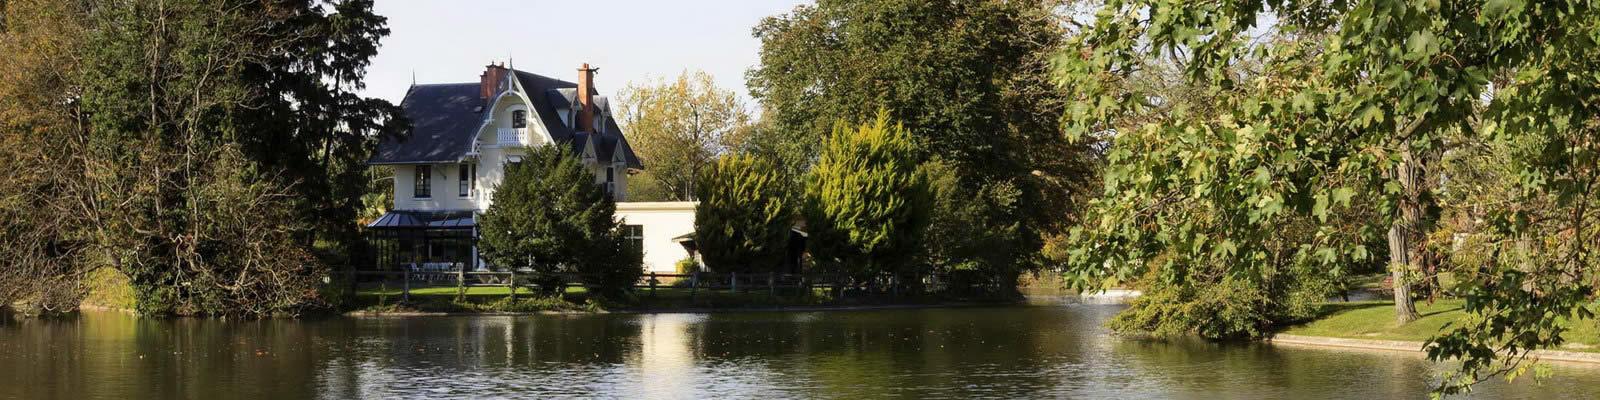 Real Estate Agency In Yvelines Nord Barnes Yvelines Nord